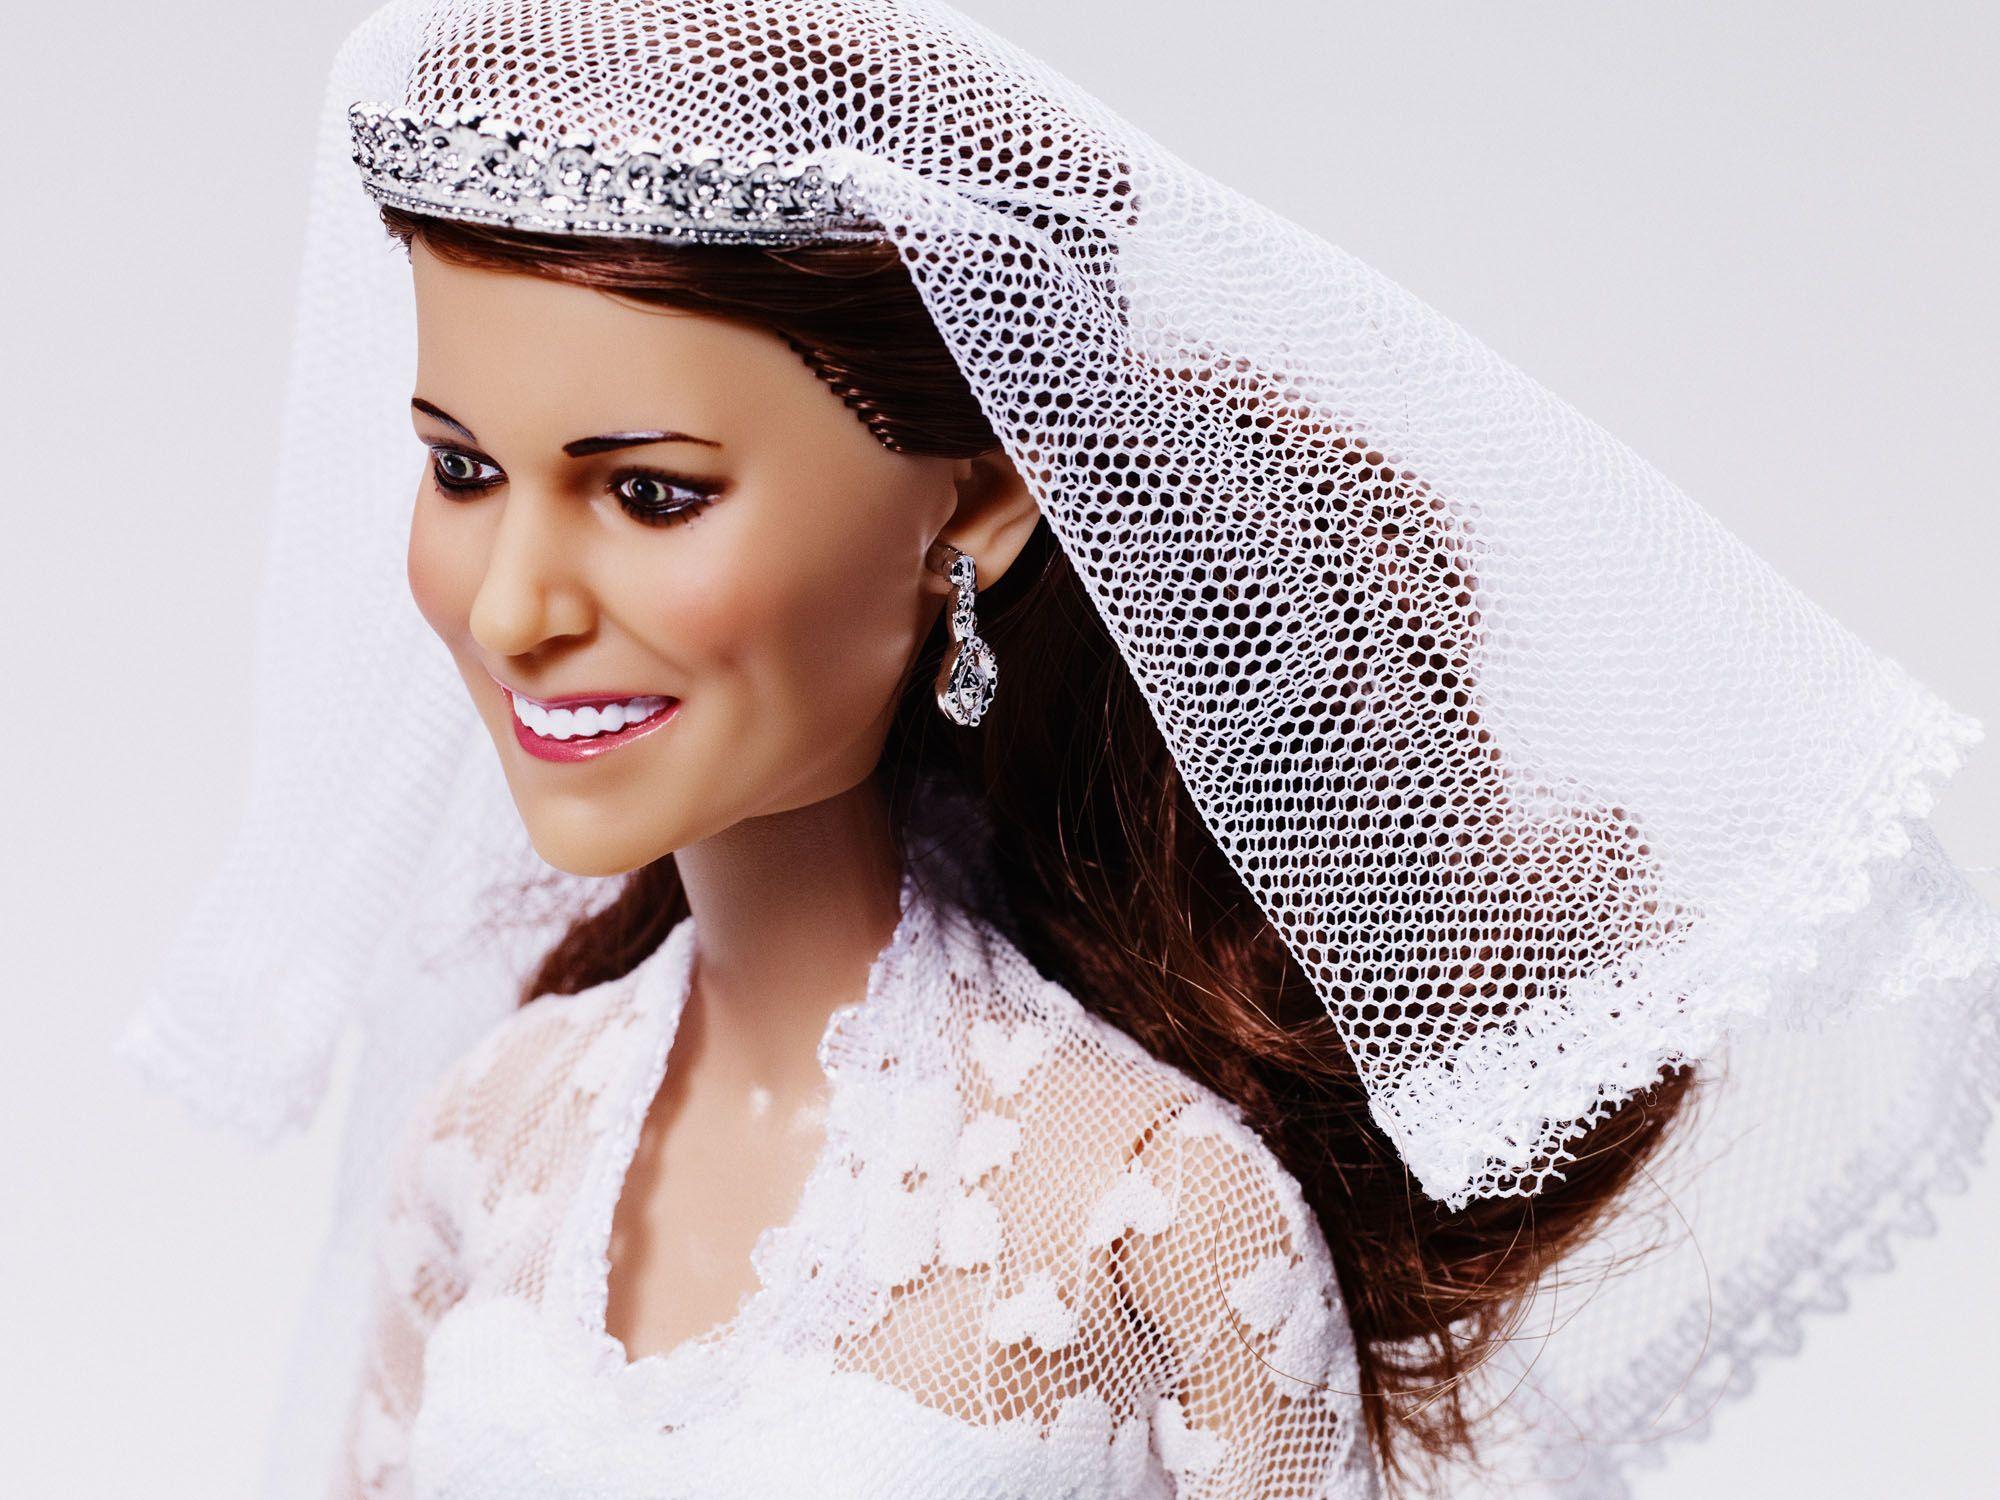 Closeup Of Robinson Pelham Earrings And Tiara Arklu Royal Wedding Dolls:  Prince William And